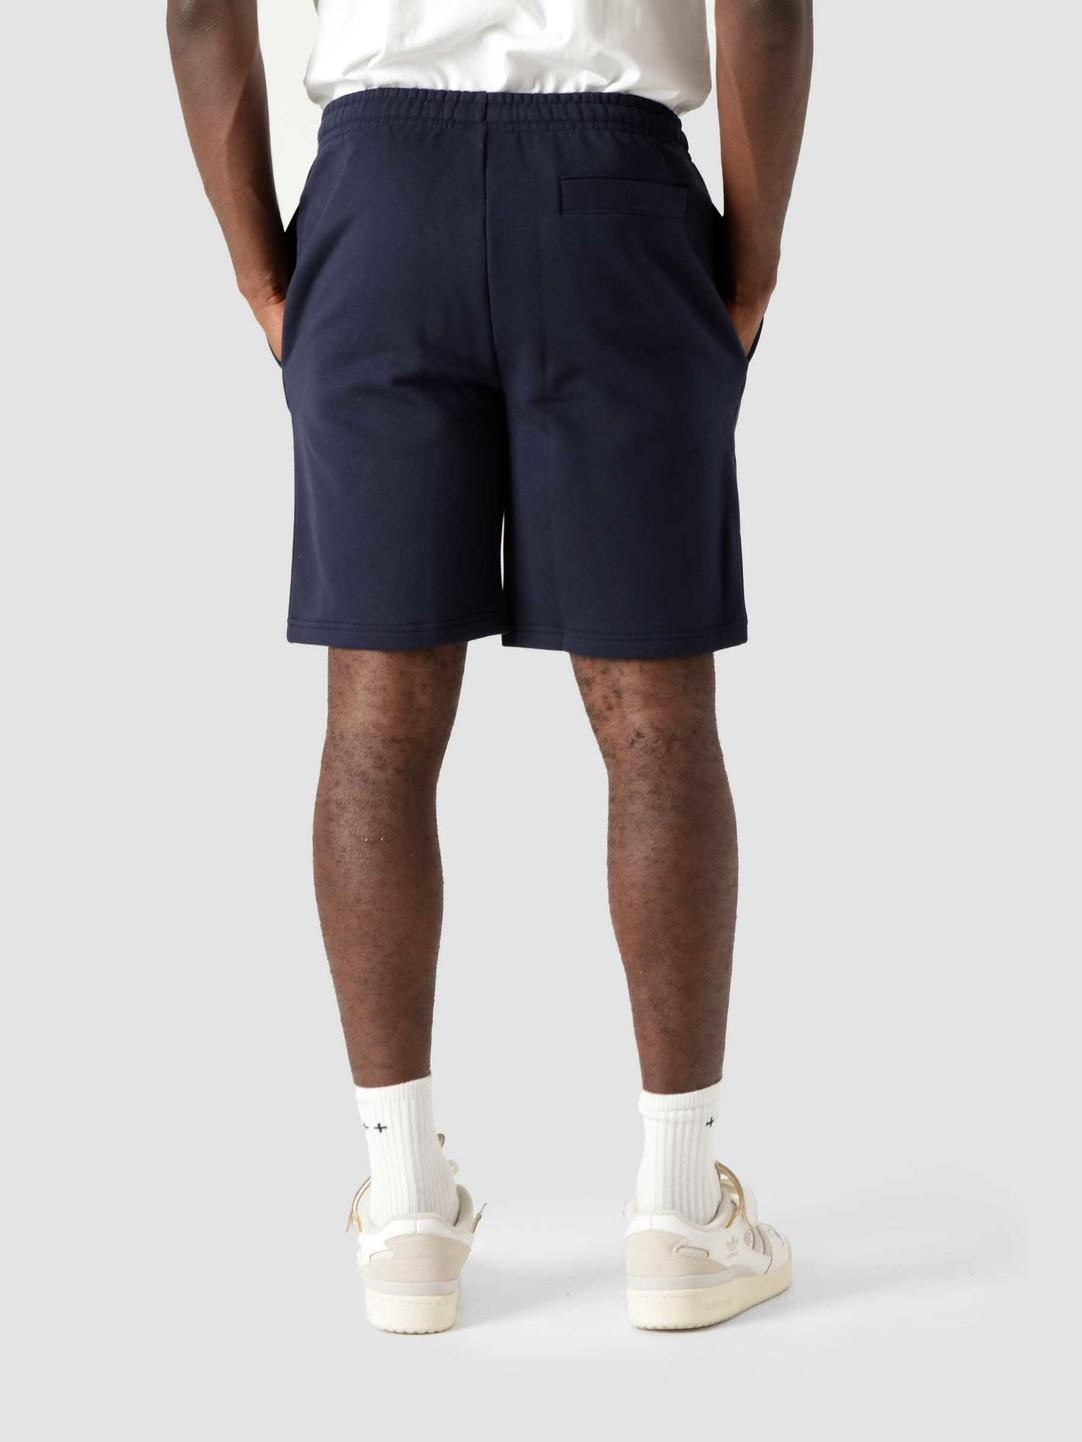 Lacoste Lacoste 1HG1 Men's Shorts 01 Navy Blue GH2136-11